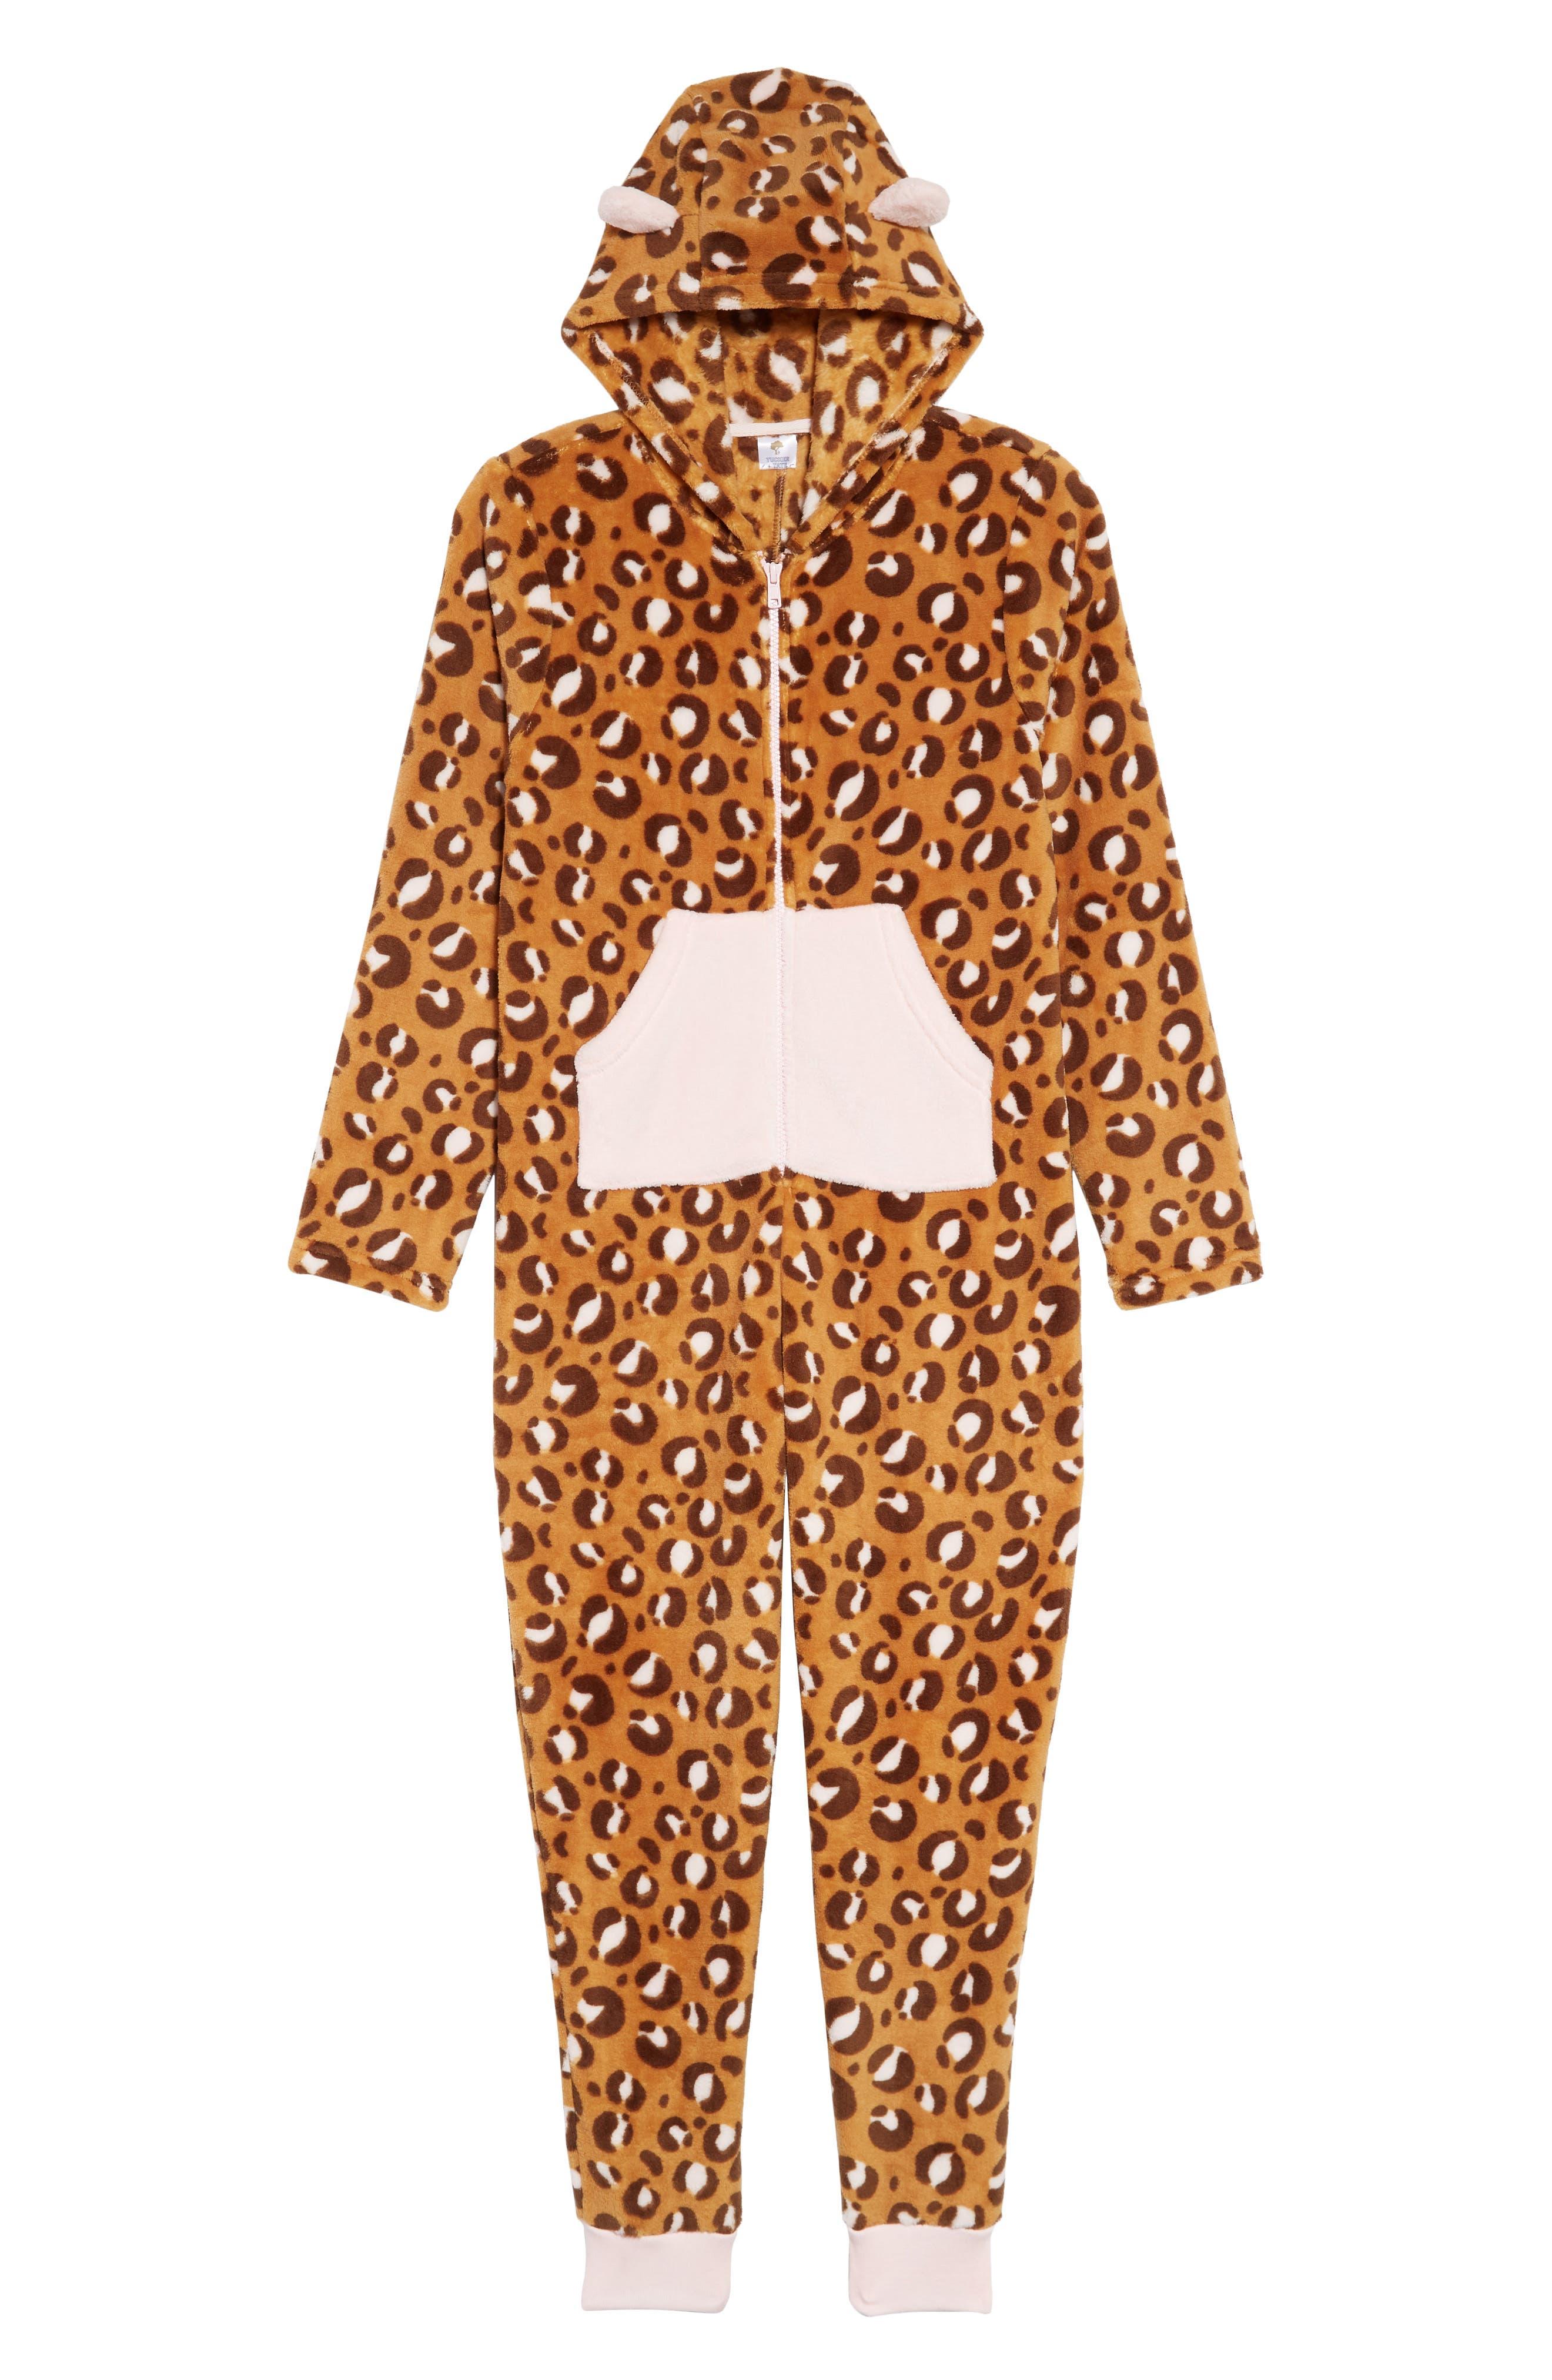 One-Piece Pajamas,                         Main,                         color, TAN DALE PUNK CHEETAH